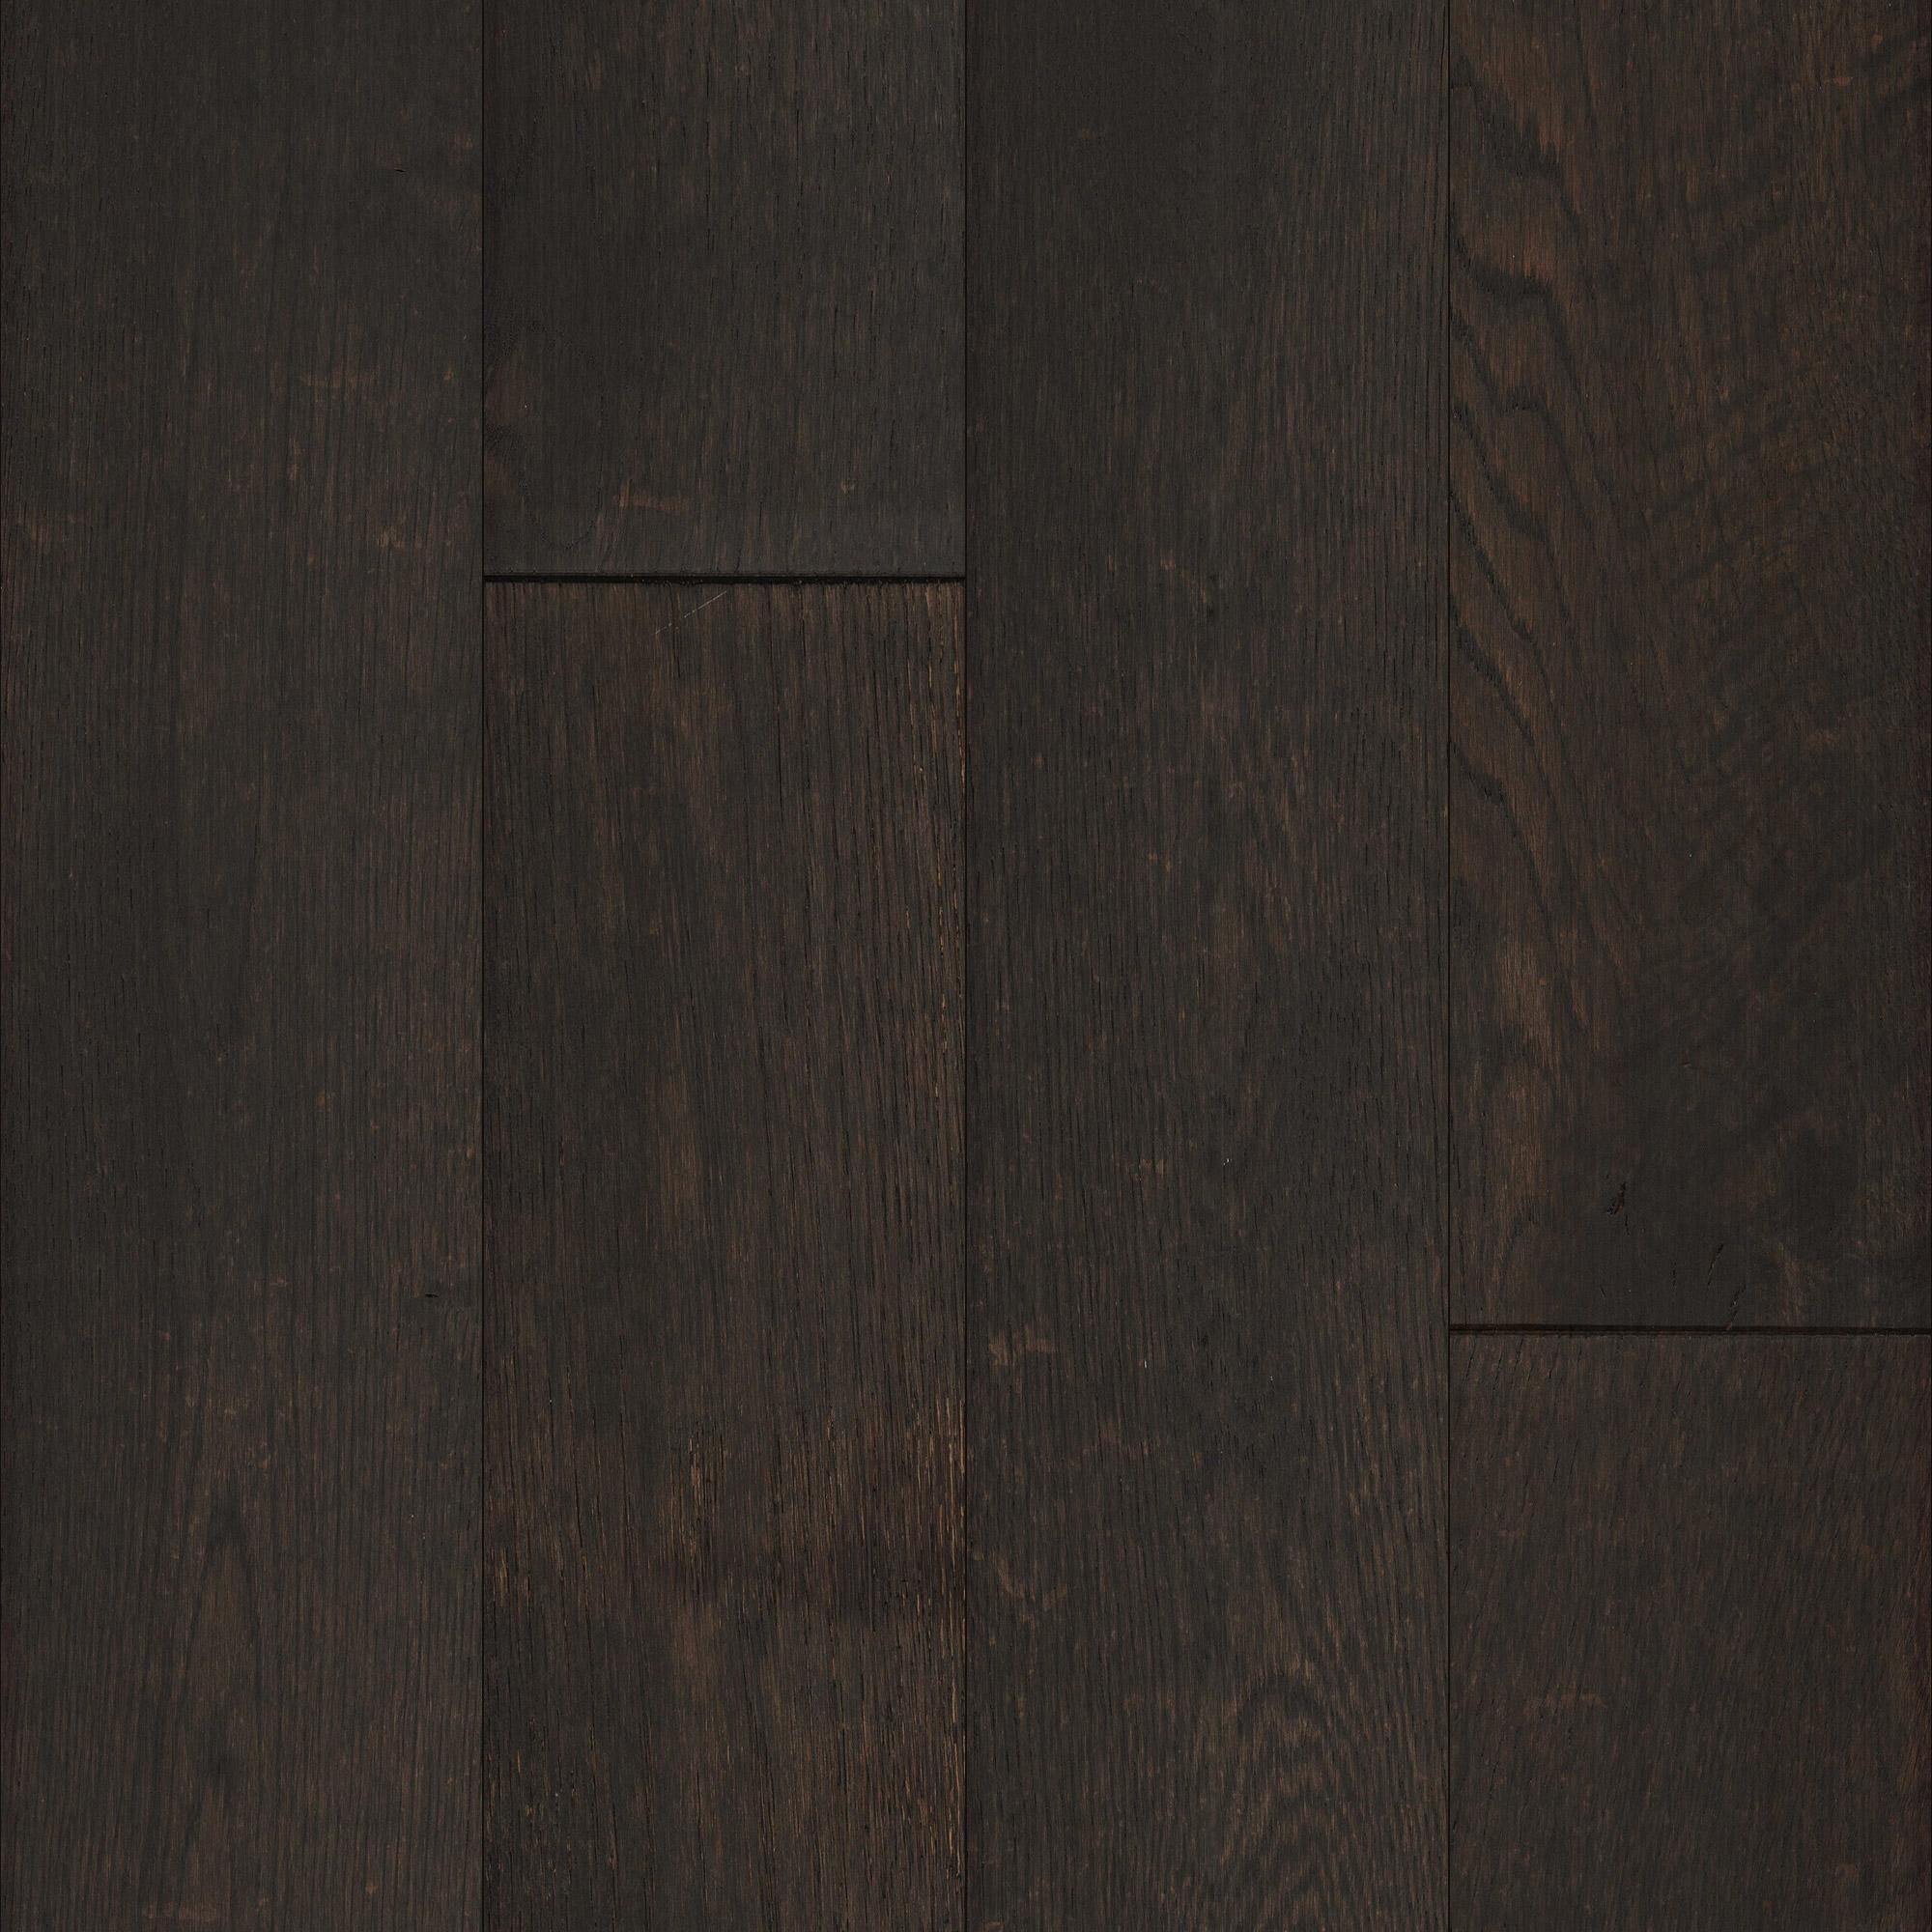 installing 3 8 inch hardwood flooring of mullican wexford oak harbor mist 5 wide solid hardwood flooring regarding file 447 1